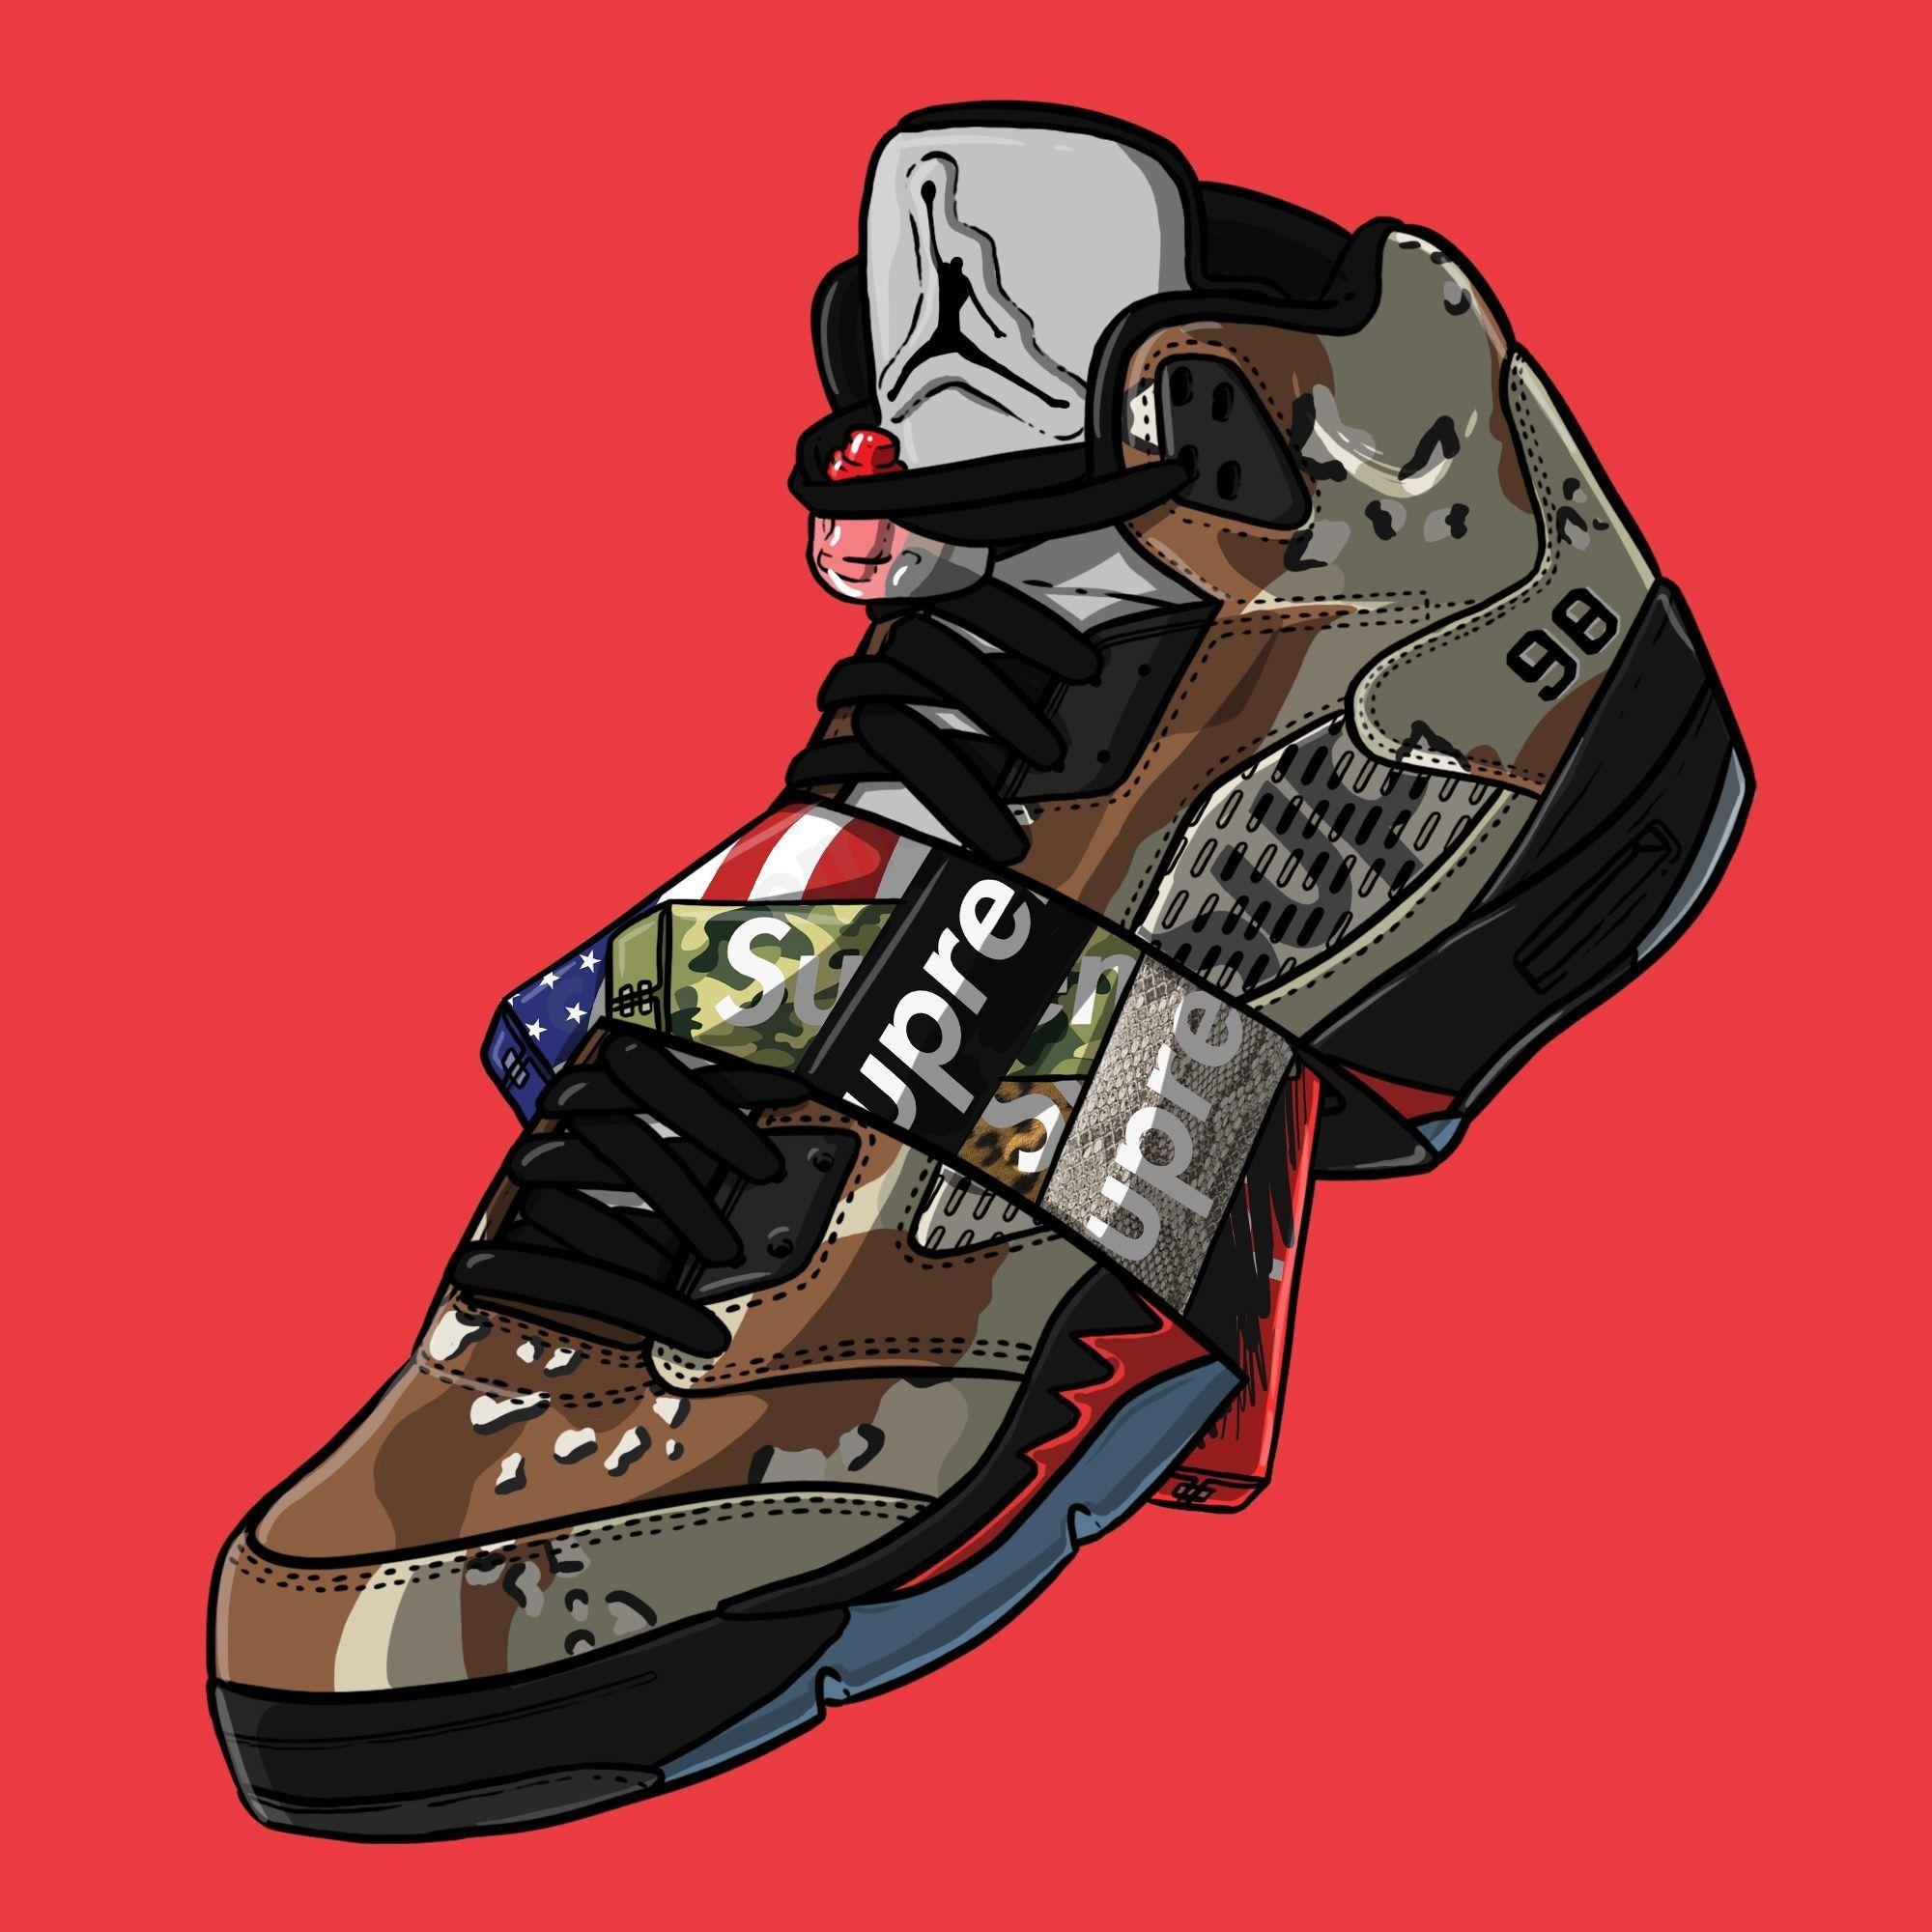 Sneaker Wallpapers - Top Free Sneaker